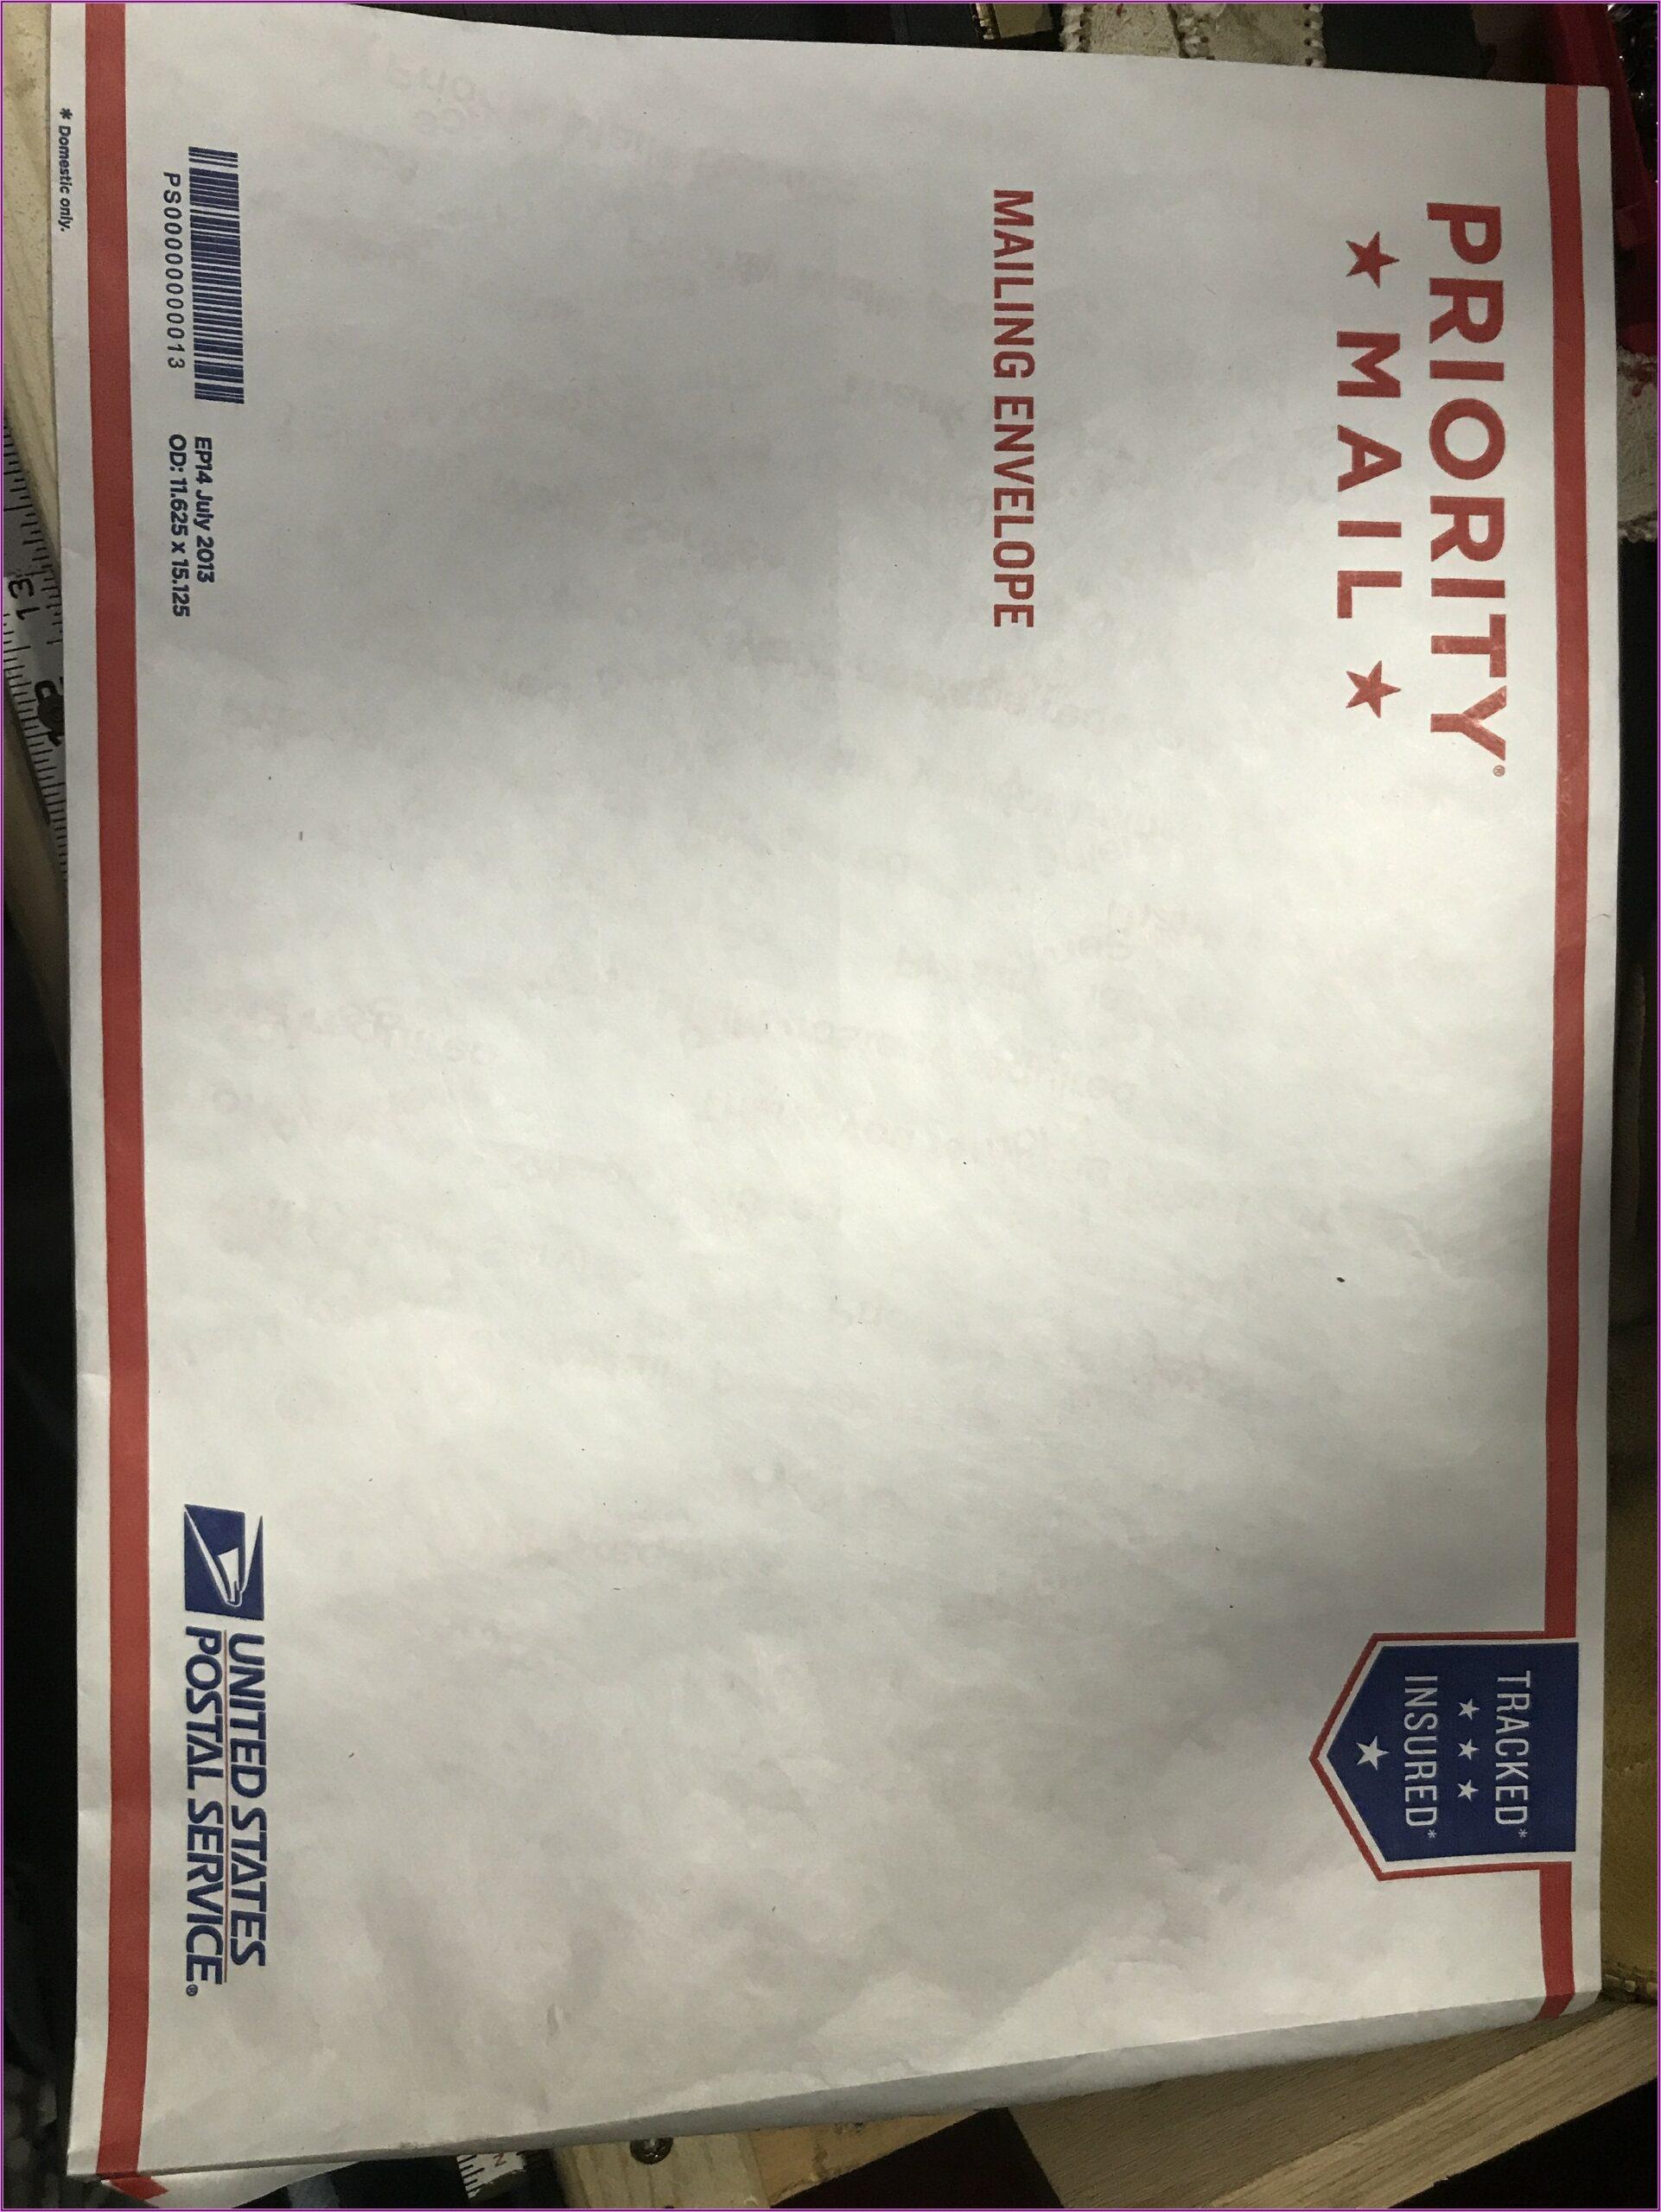 Postal Rates For Flat Rate Envelopes